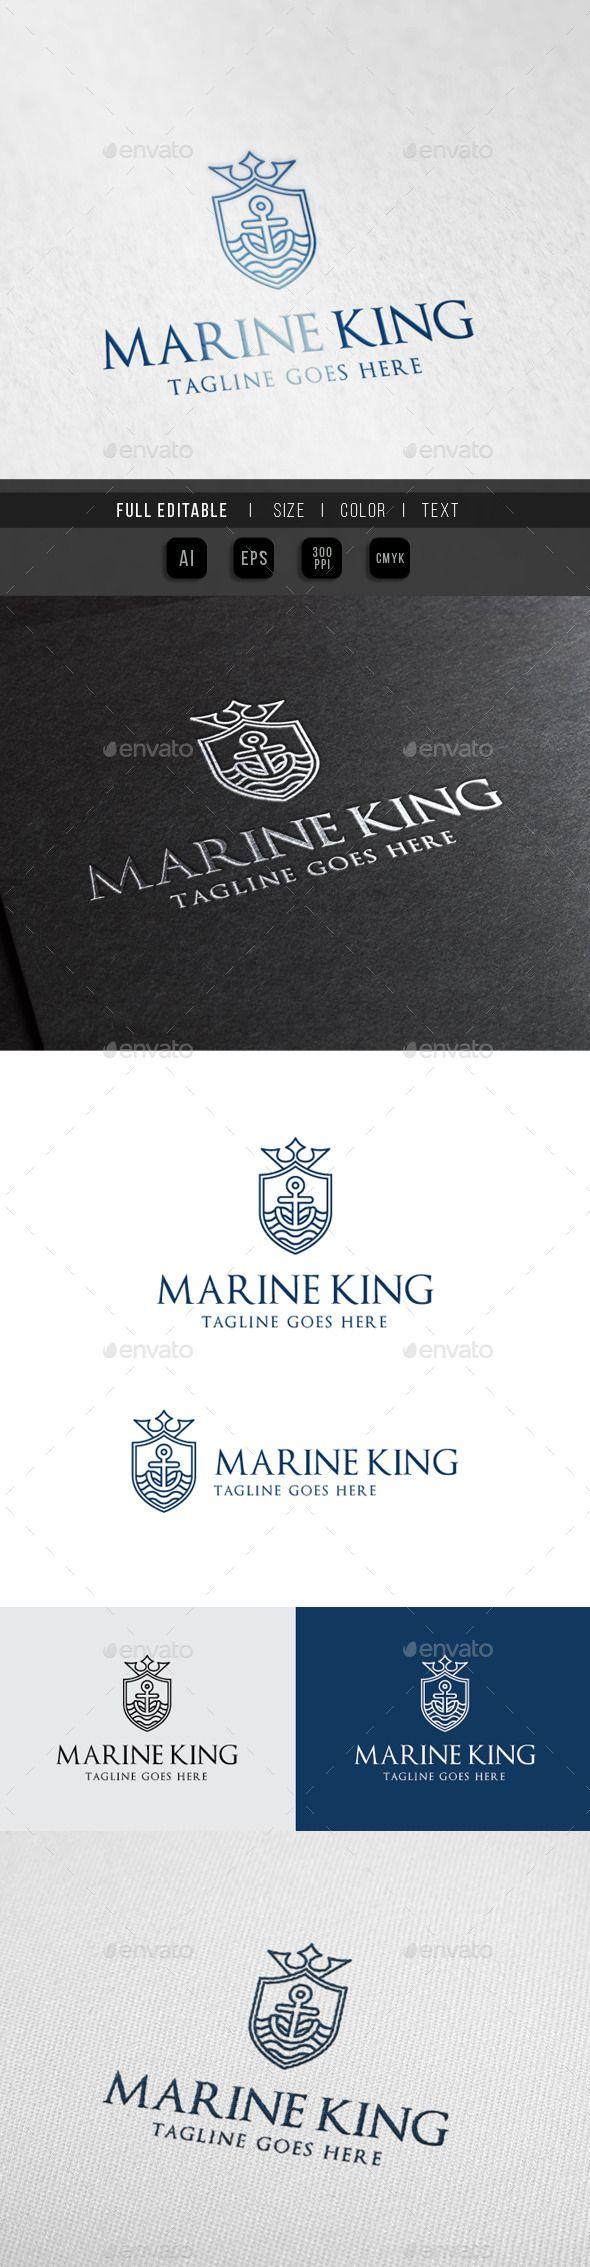 Marine King - Royal Ocean Template #design Download: http://graphicriver.net/item/marine-king-royal-ocean/10111470?ref=ksioks